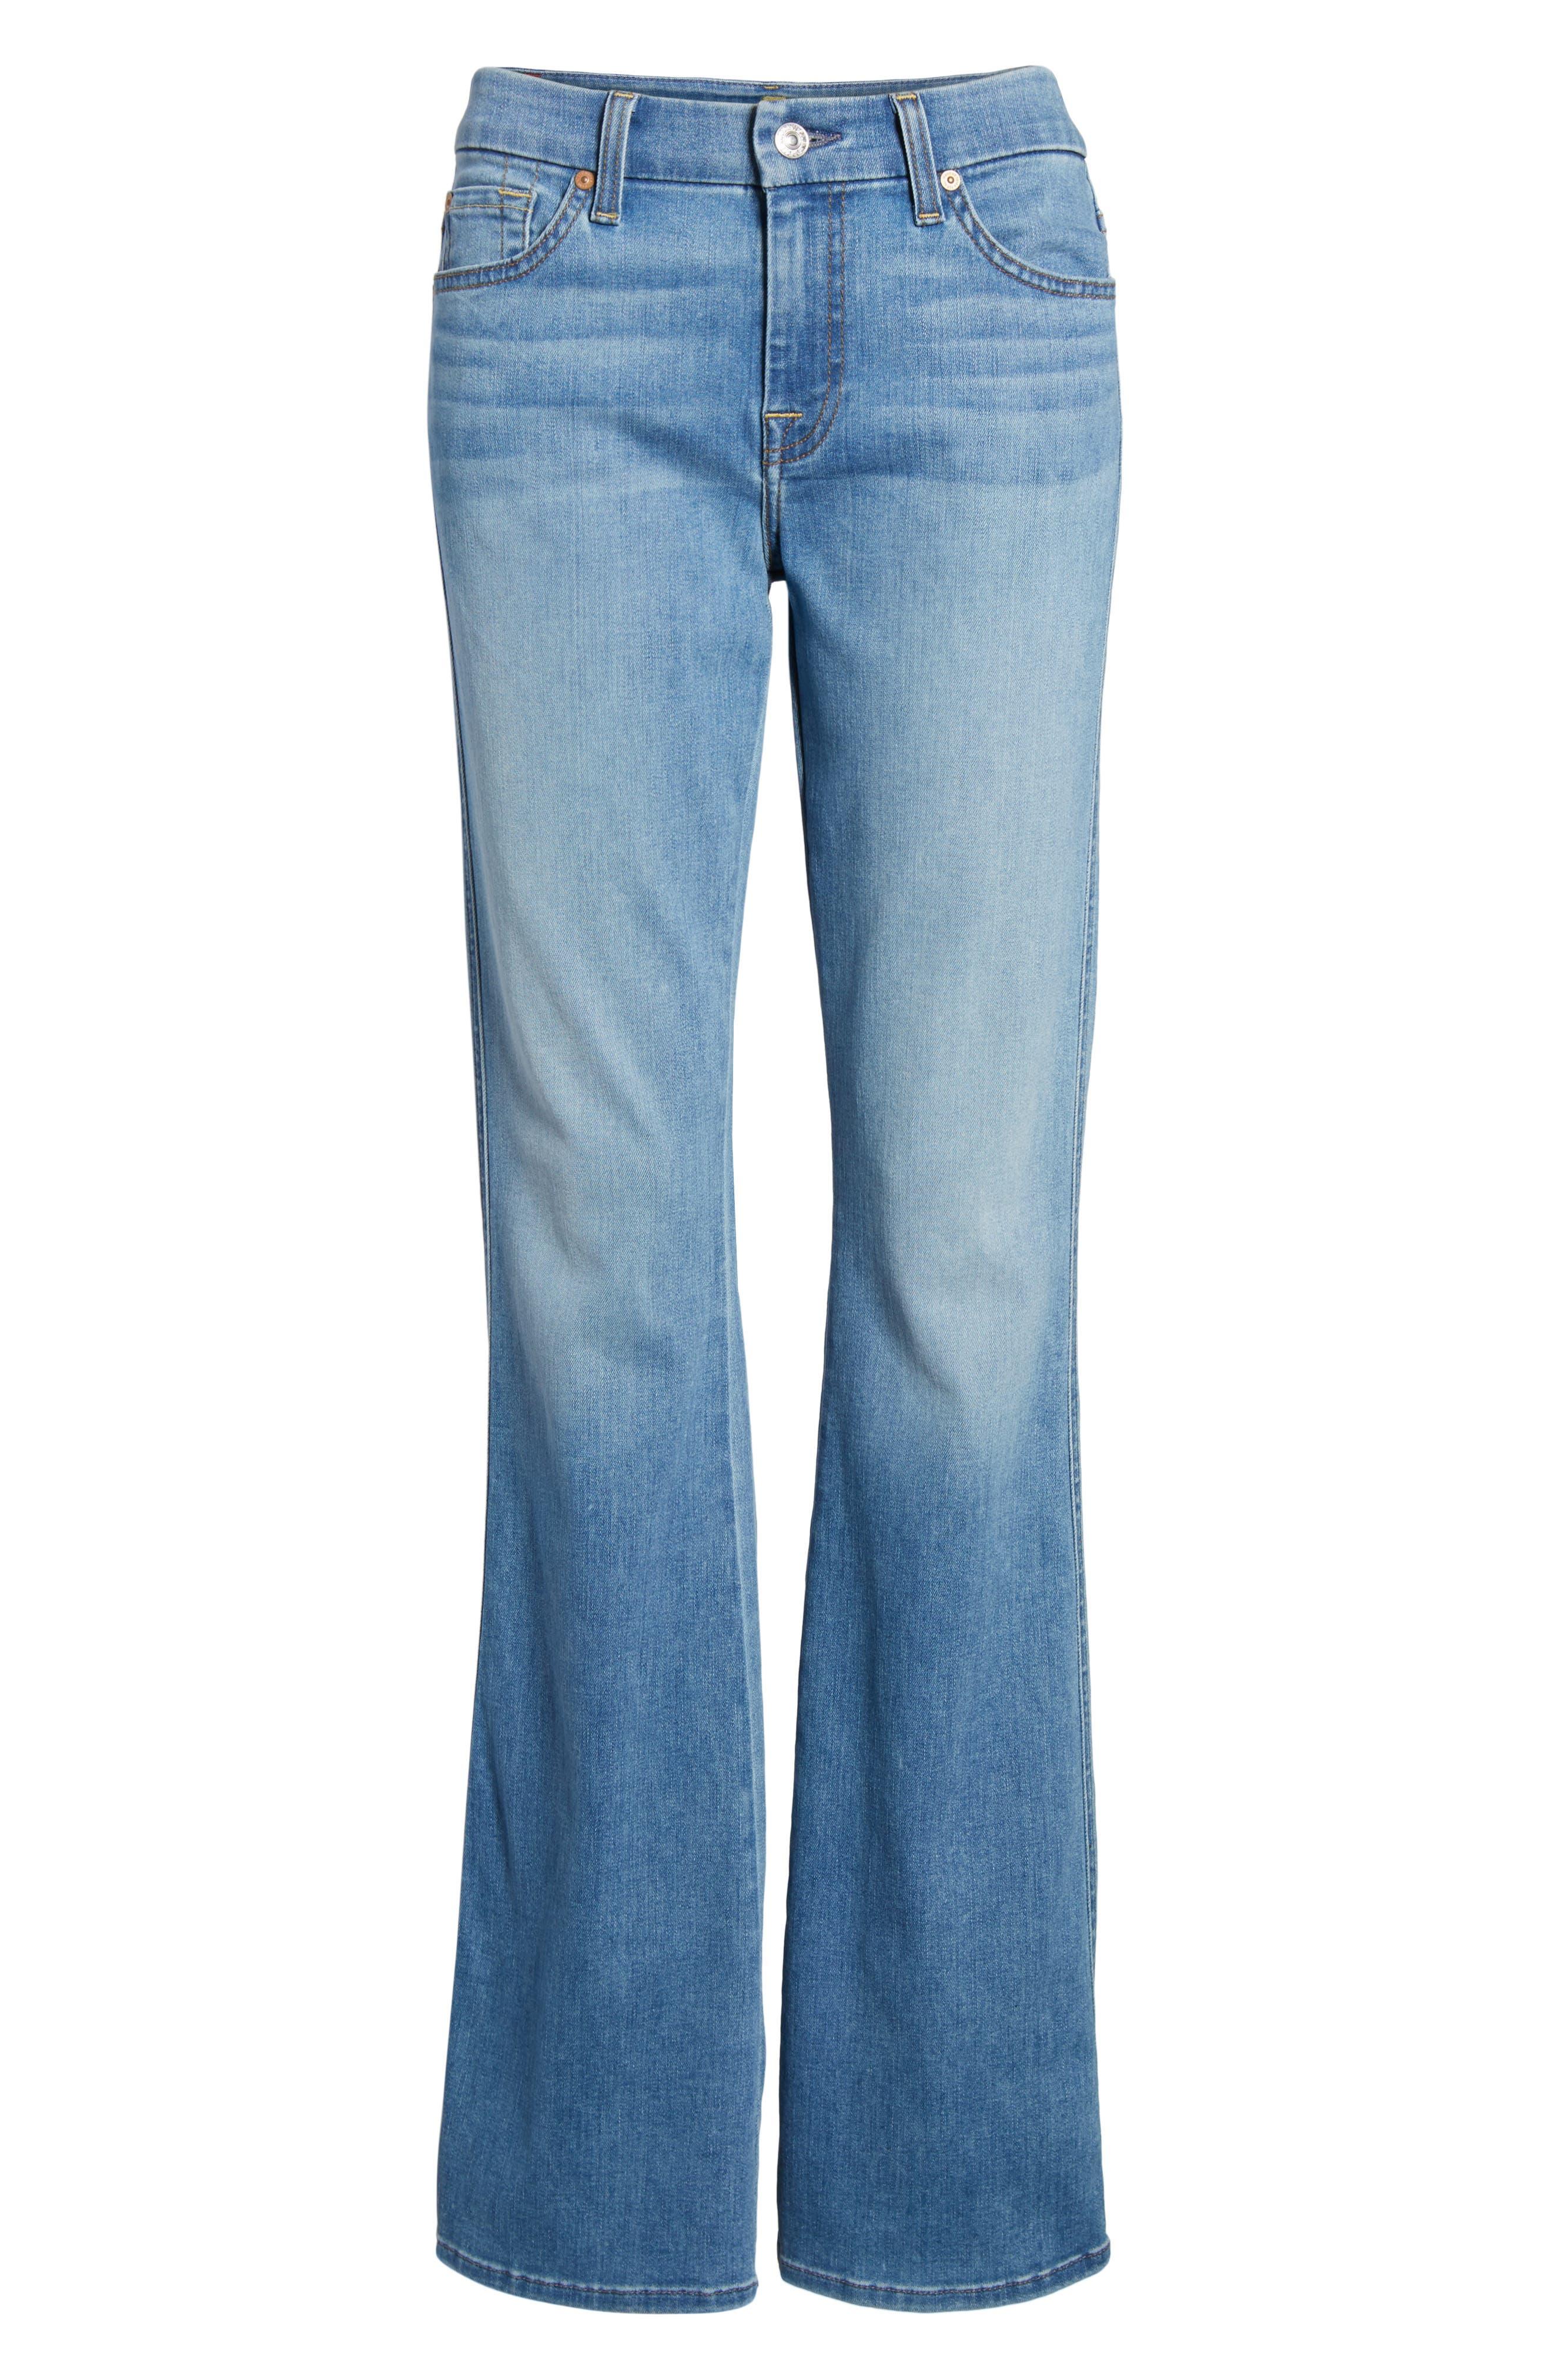 A-Pocket Flare Leg Jeans,                             Alternate thumbnail 7, color,                             Bright Palms